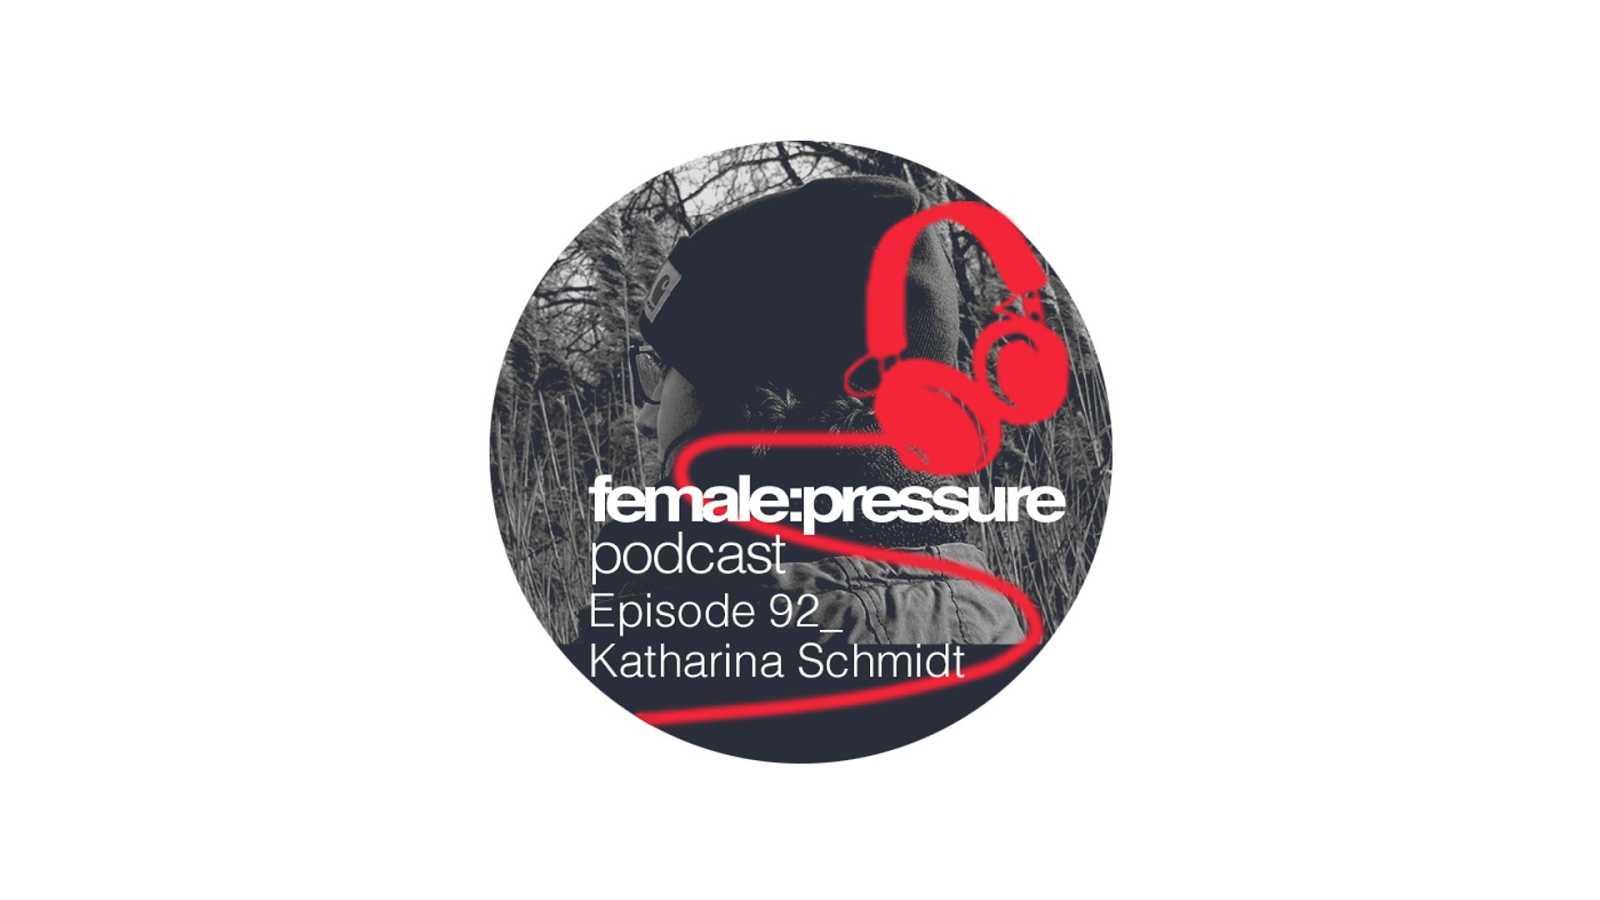 Resonancias - KATHARINA SCHMIDT - 22/09/21 - Escuchar ahora